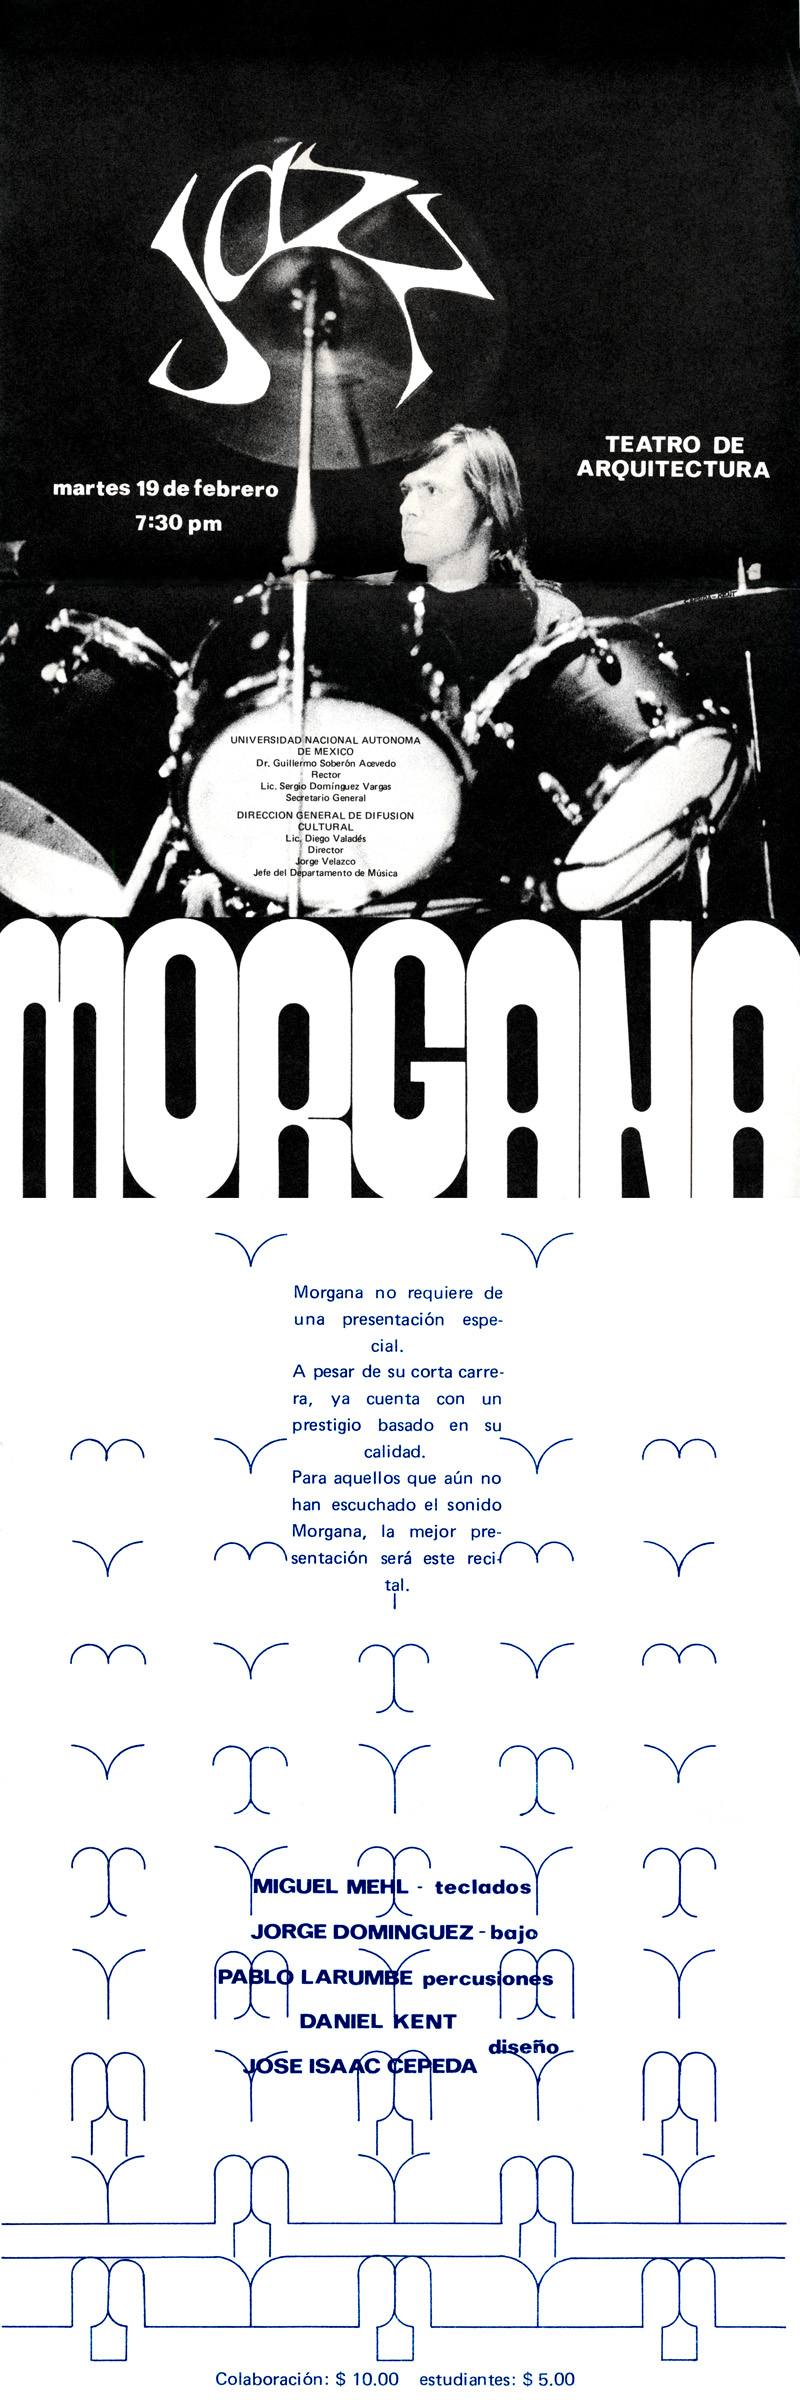 1974_Michael-Mehl_Morgana_UNAM-Arquitectura-Concert-Poster_Mexico-City